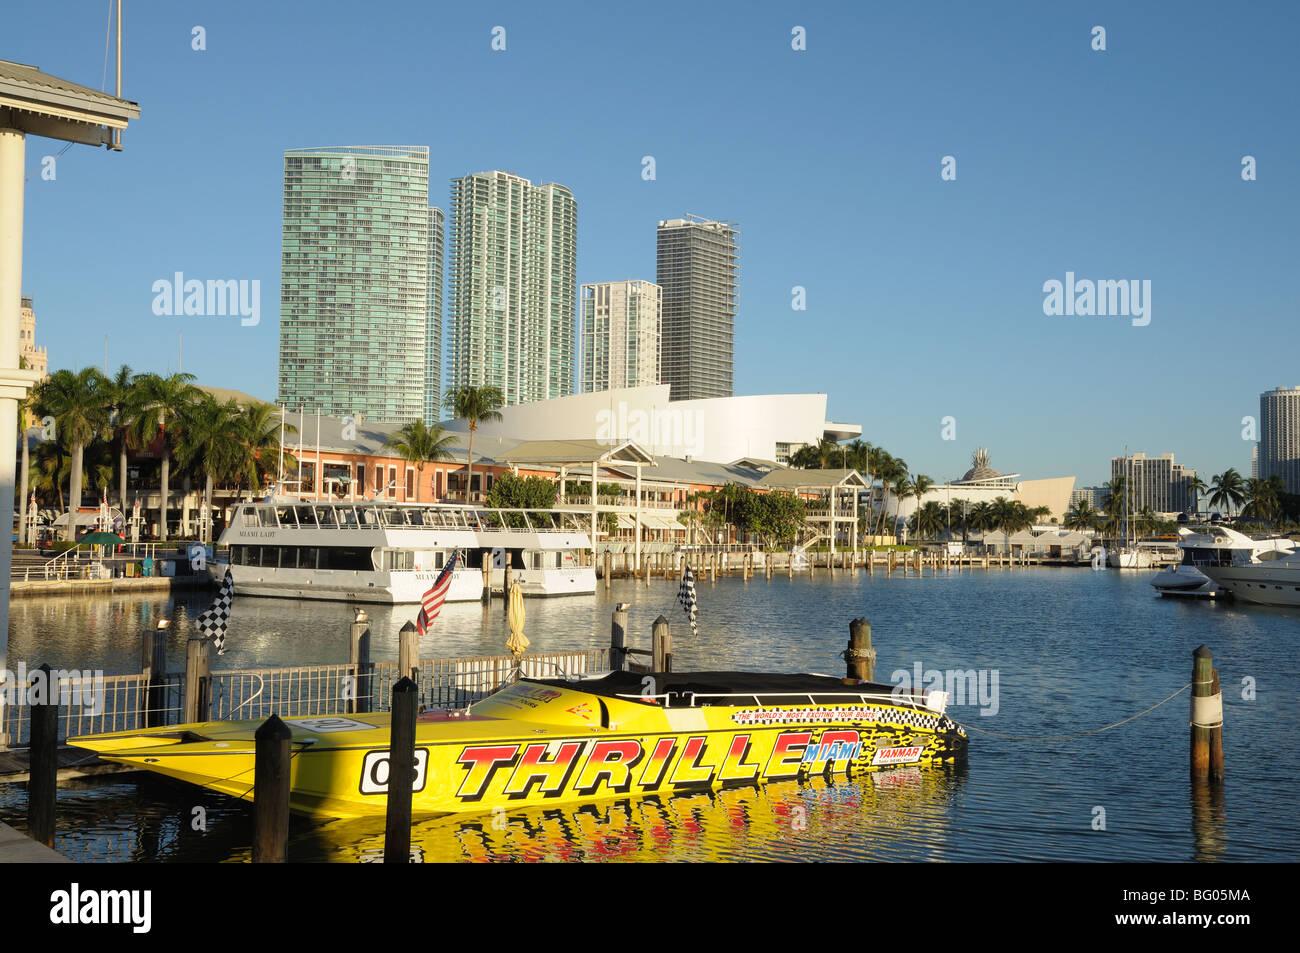 Yellow speedboat at the Bayside Marina, Downtown Miami, Florida USA Stock Photo